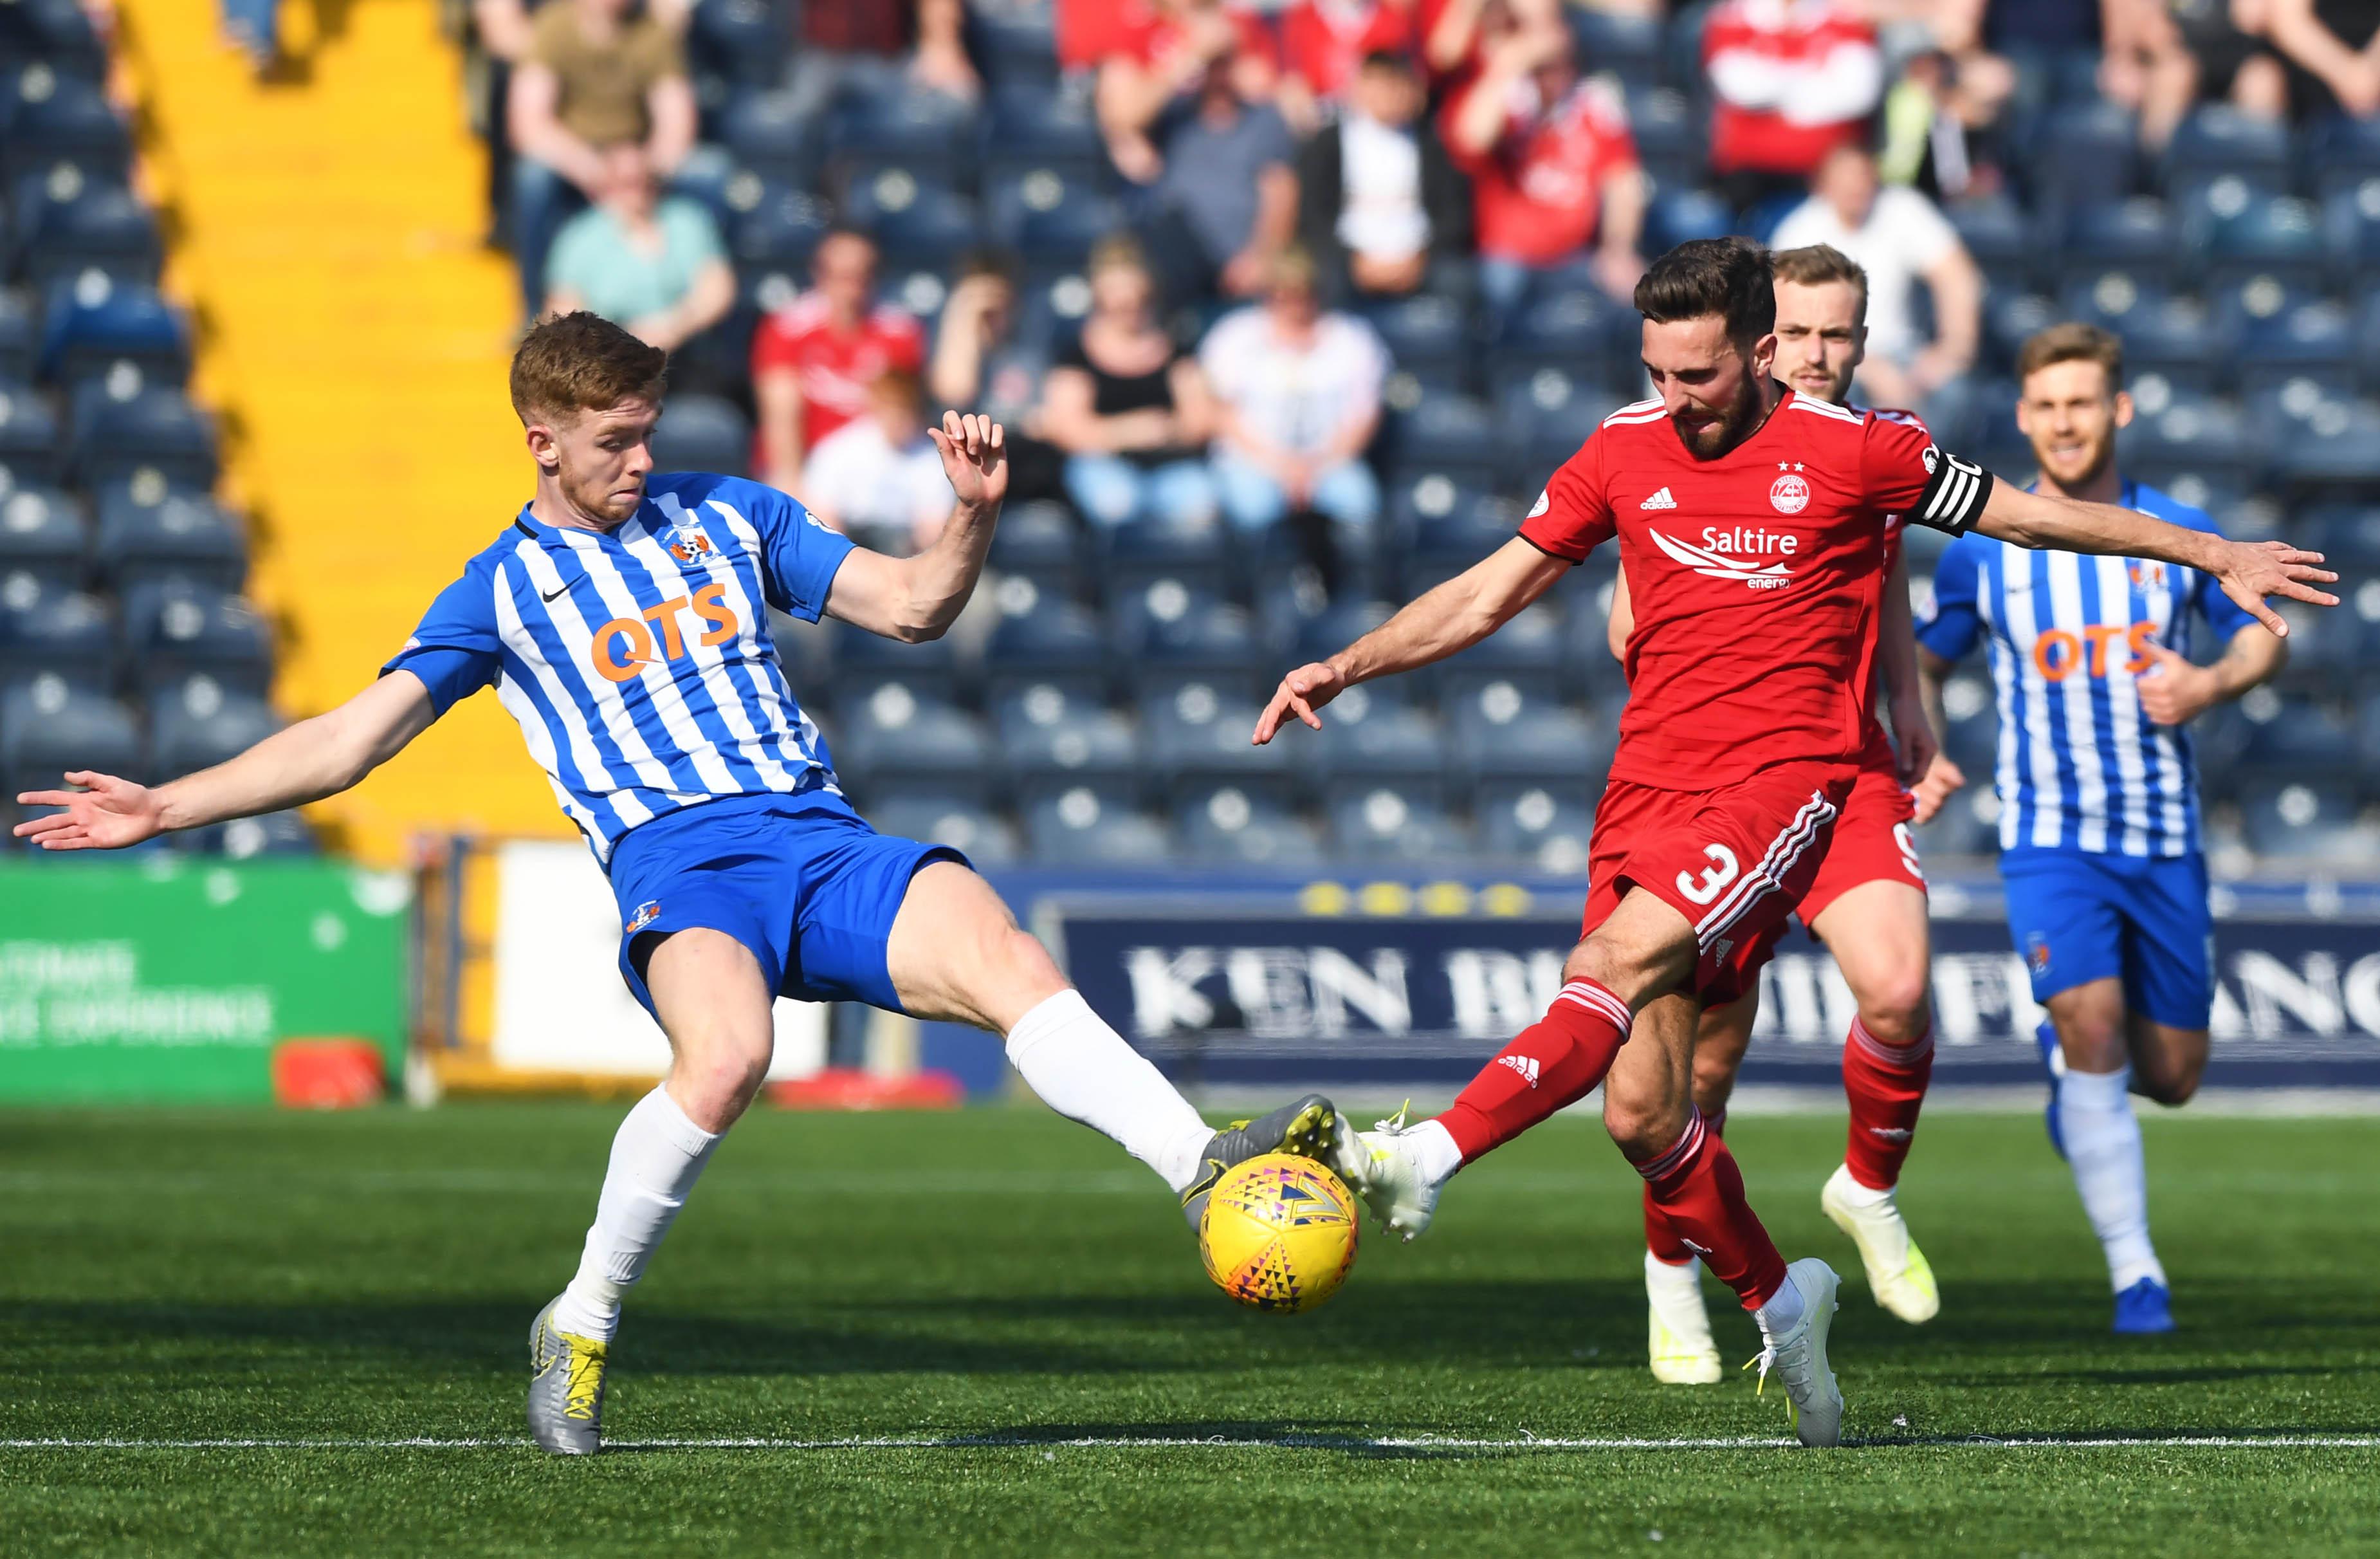 Kilmarnock's Stuart Findlay, left, challenges Aberdeen's Graeme Shinnie and is sent off.